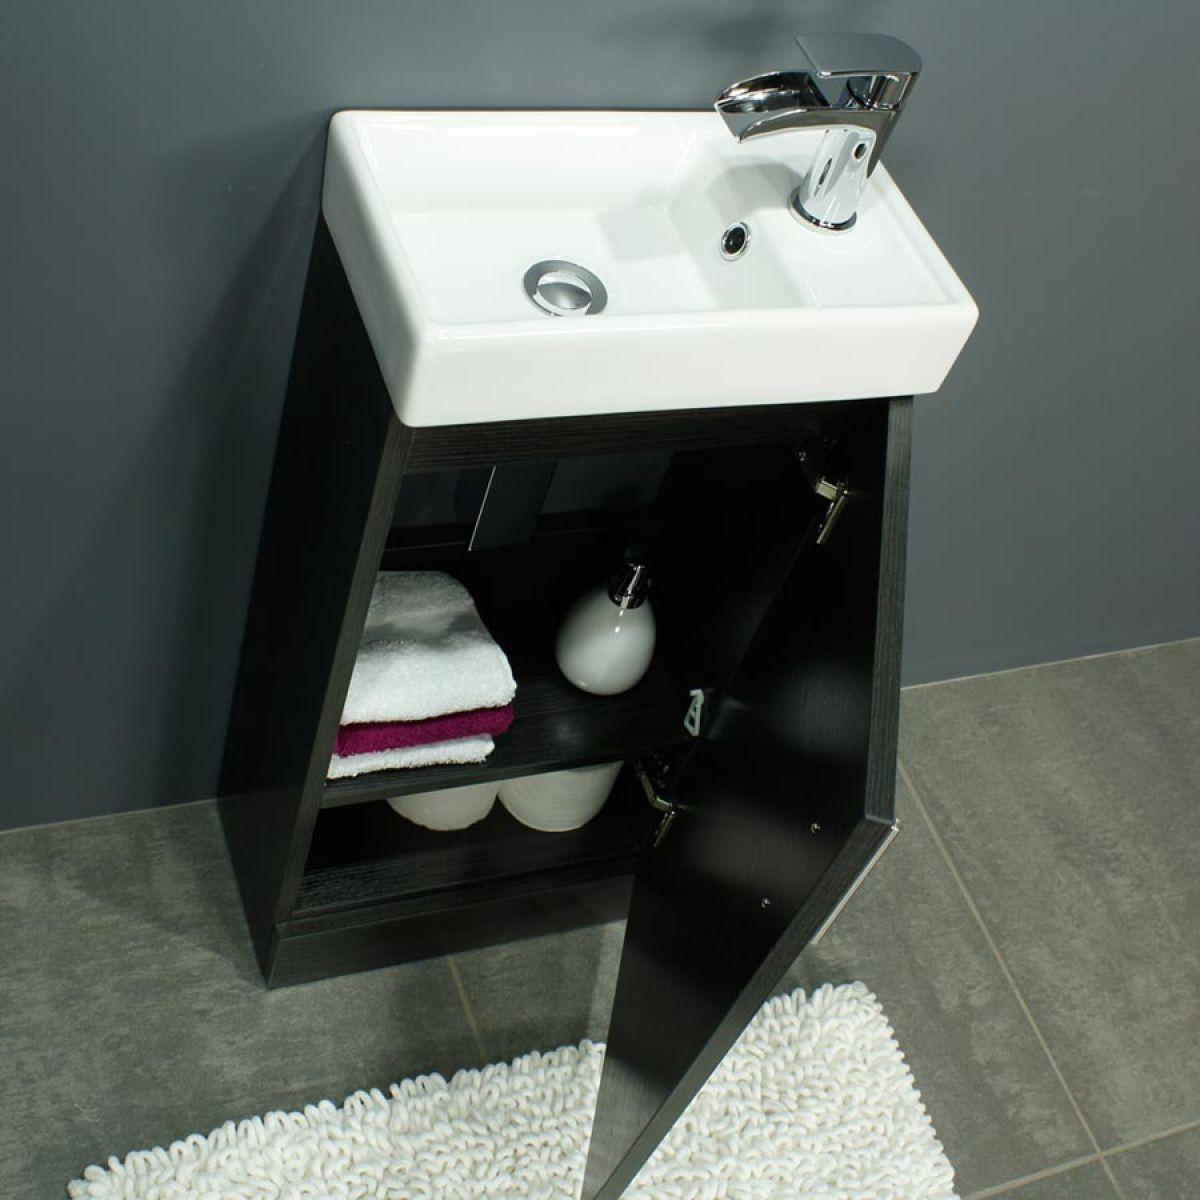 RAK Series 600 Back To Wall Toilet and 400 Series Walnut Vanity Unit Door